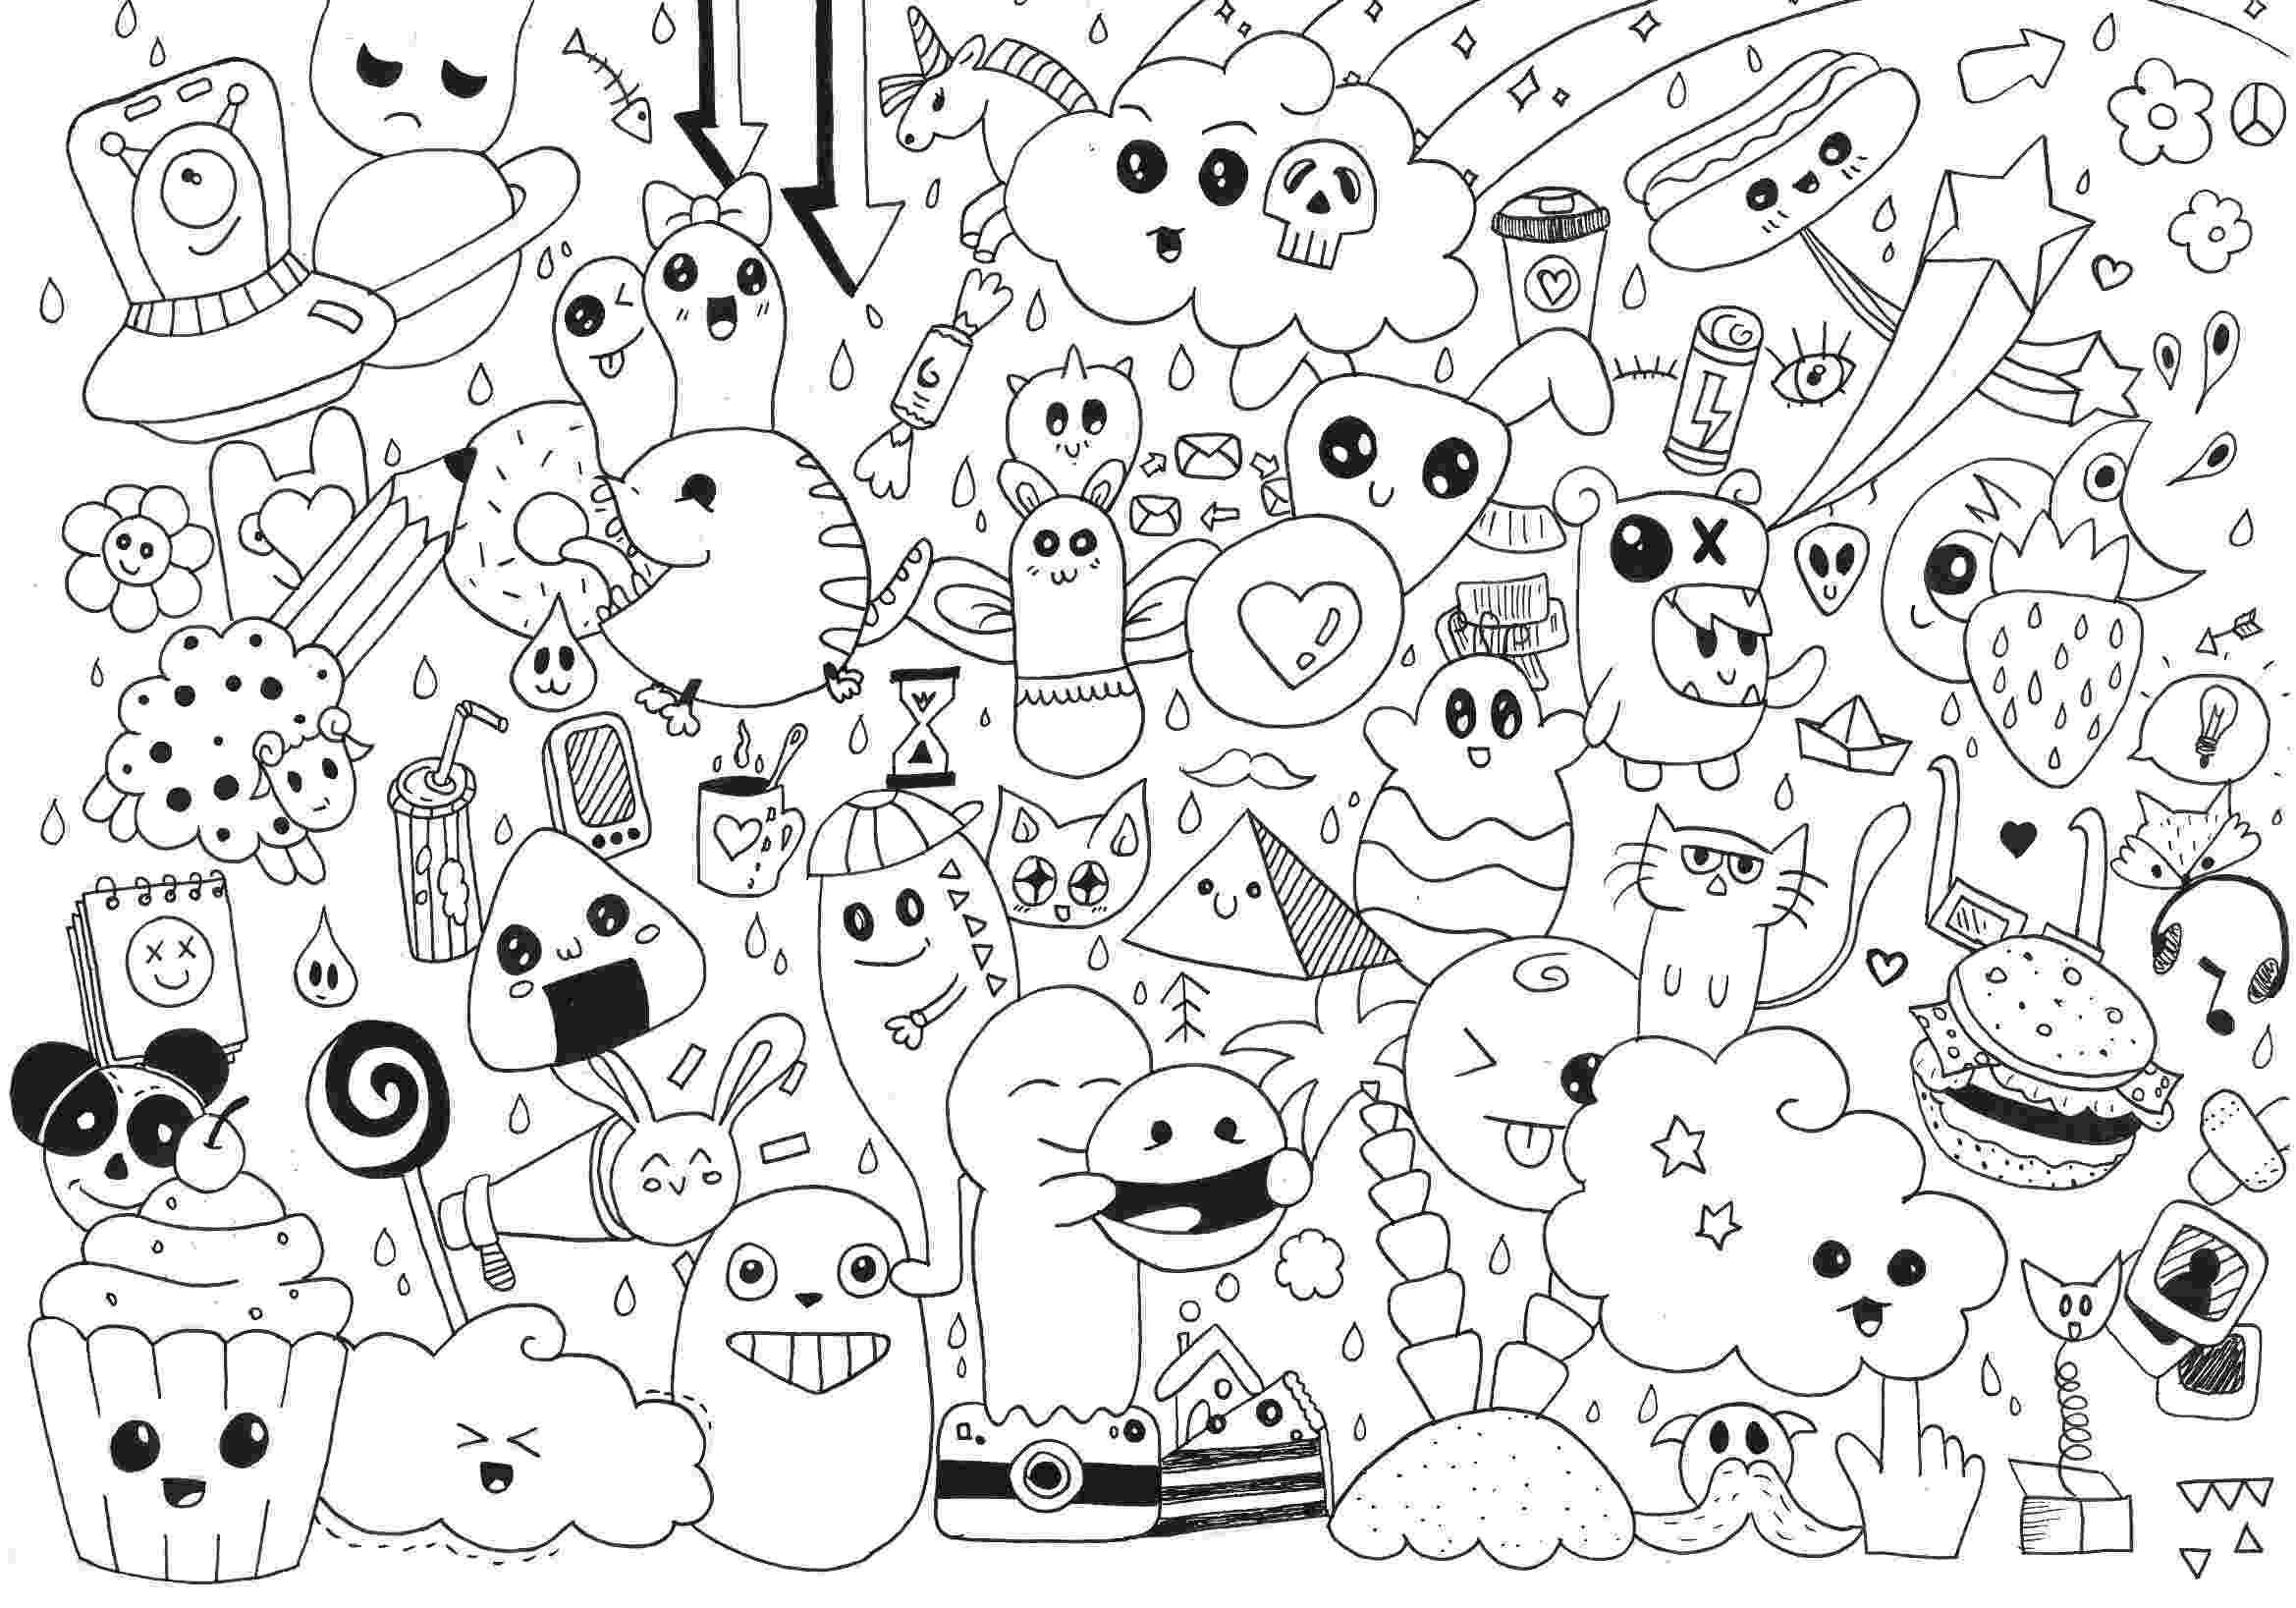 doodle art coloring book adult doodle art doodling 5 coloring pages printable art book coloring doodle